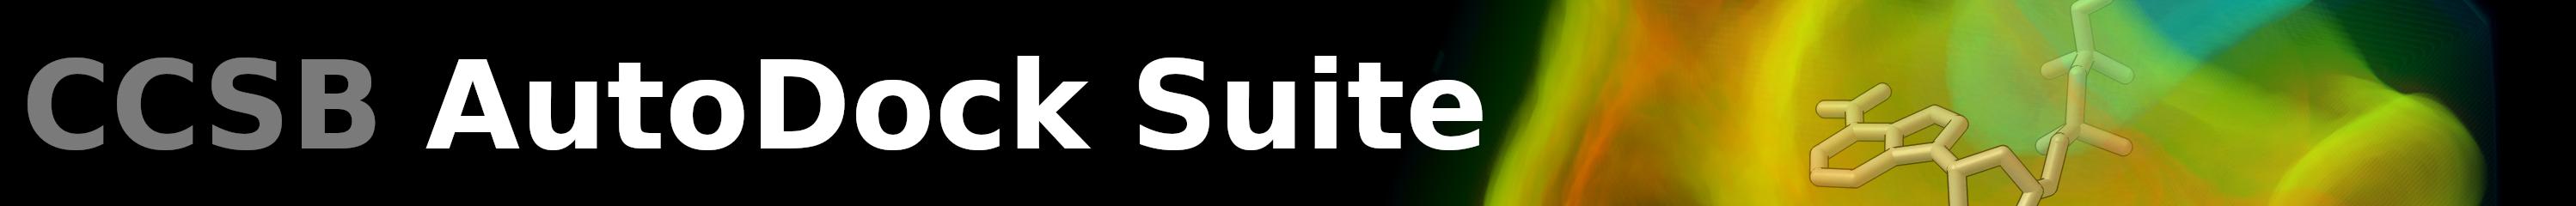 AutoDock Suite Logo